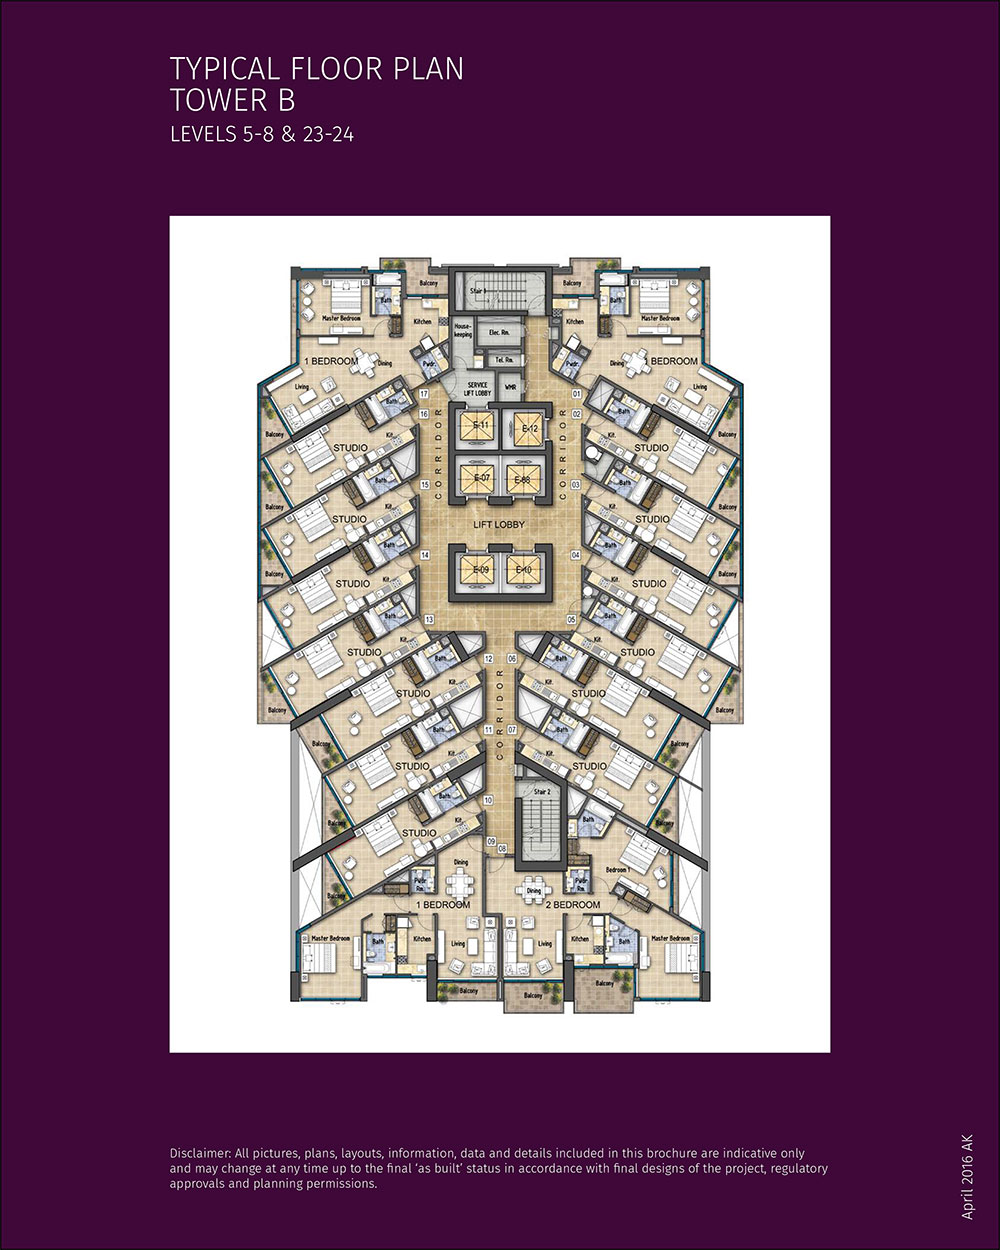 Tower B Levels 5 8 & 23 24